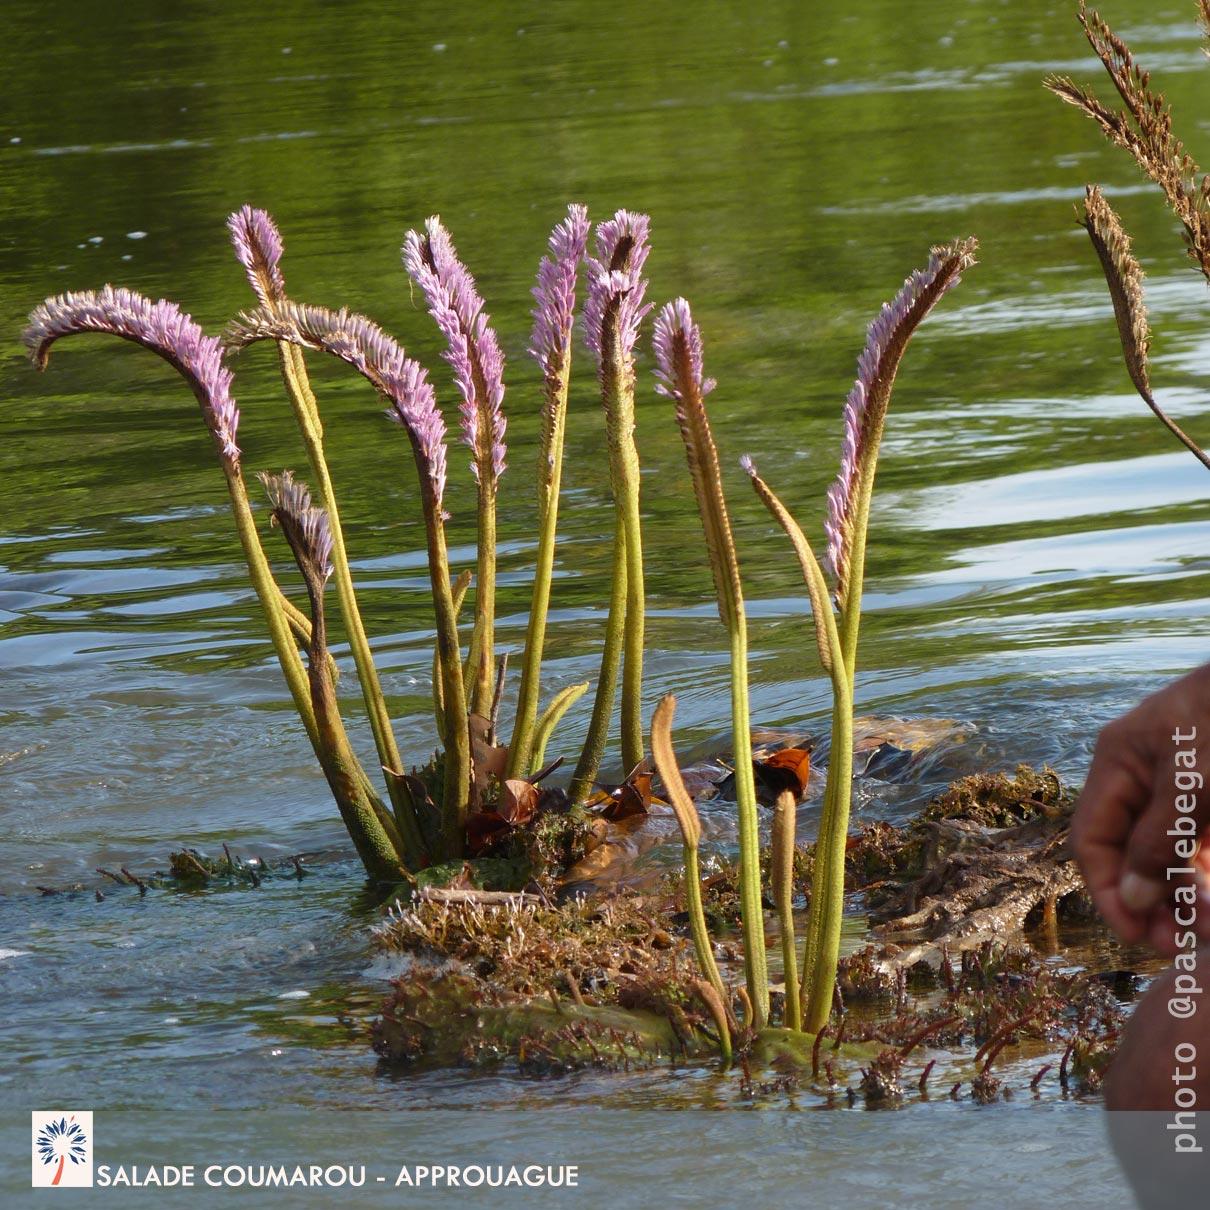 biopiratage foret amazonienne